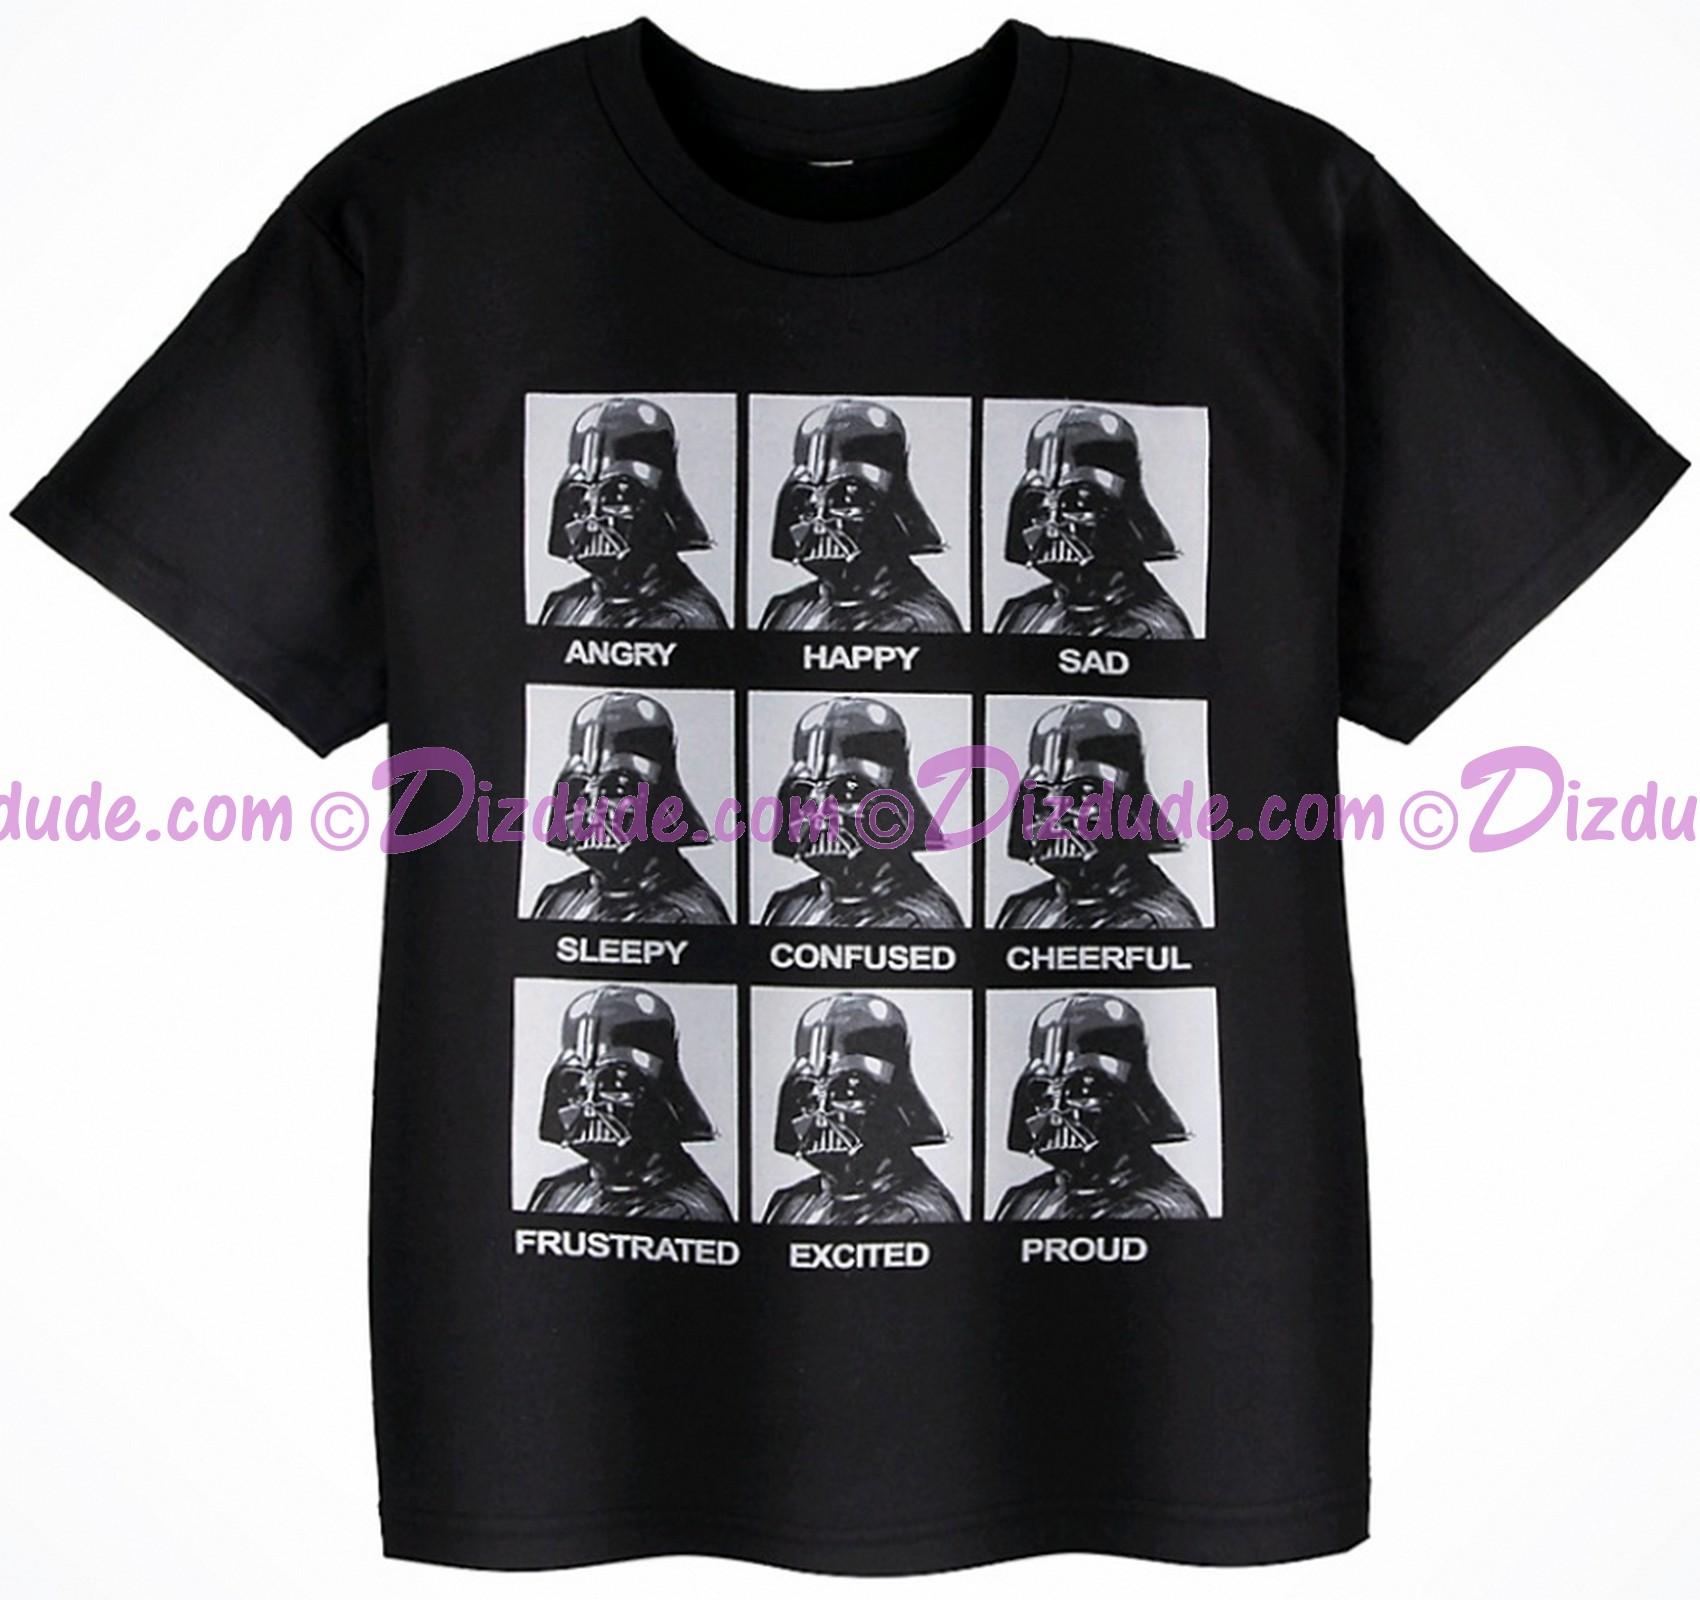 Disney Star Wars Darth Vader Emotions Youth T-Shirt (Tshirt, T shirt or Tee) © Dizdude.com